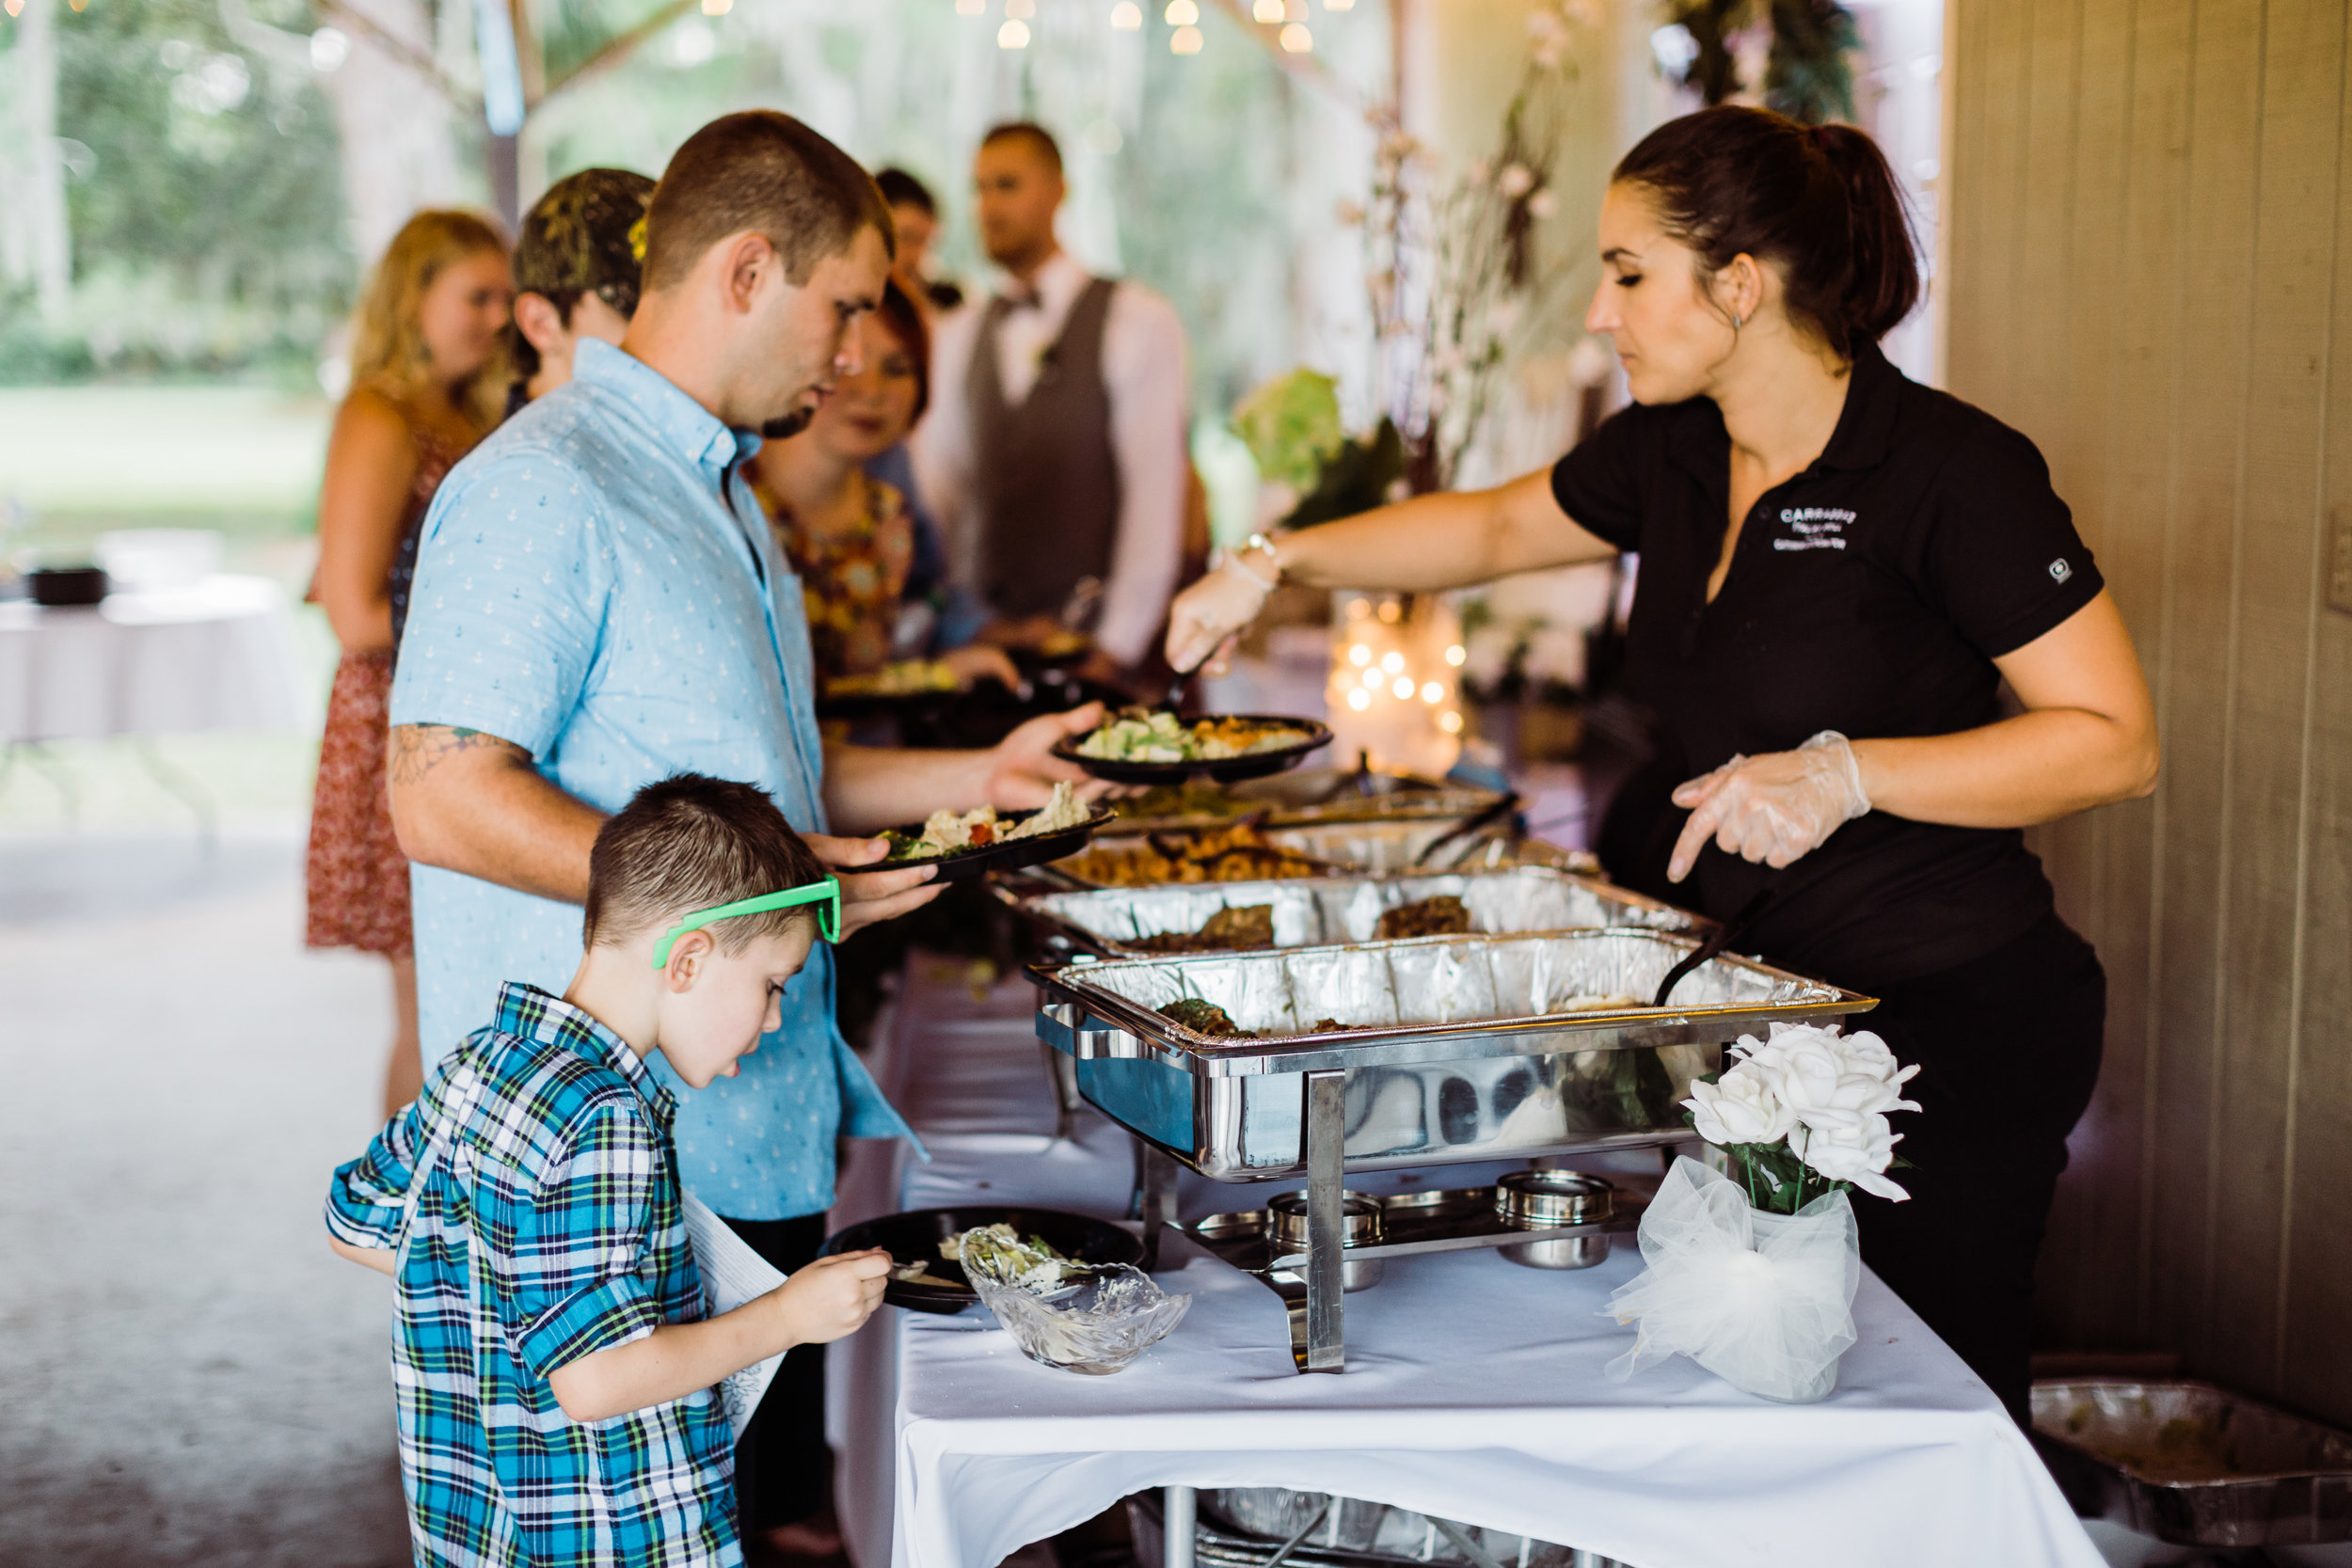 2017.10.14 Samantha and Matthew Crabtree Sarasota Wedding (499 of 708).jpg